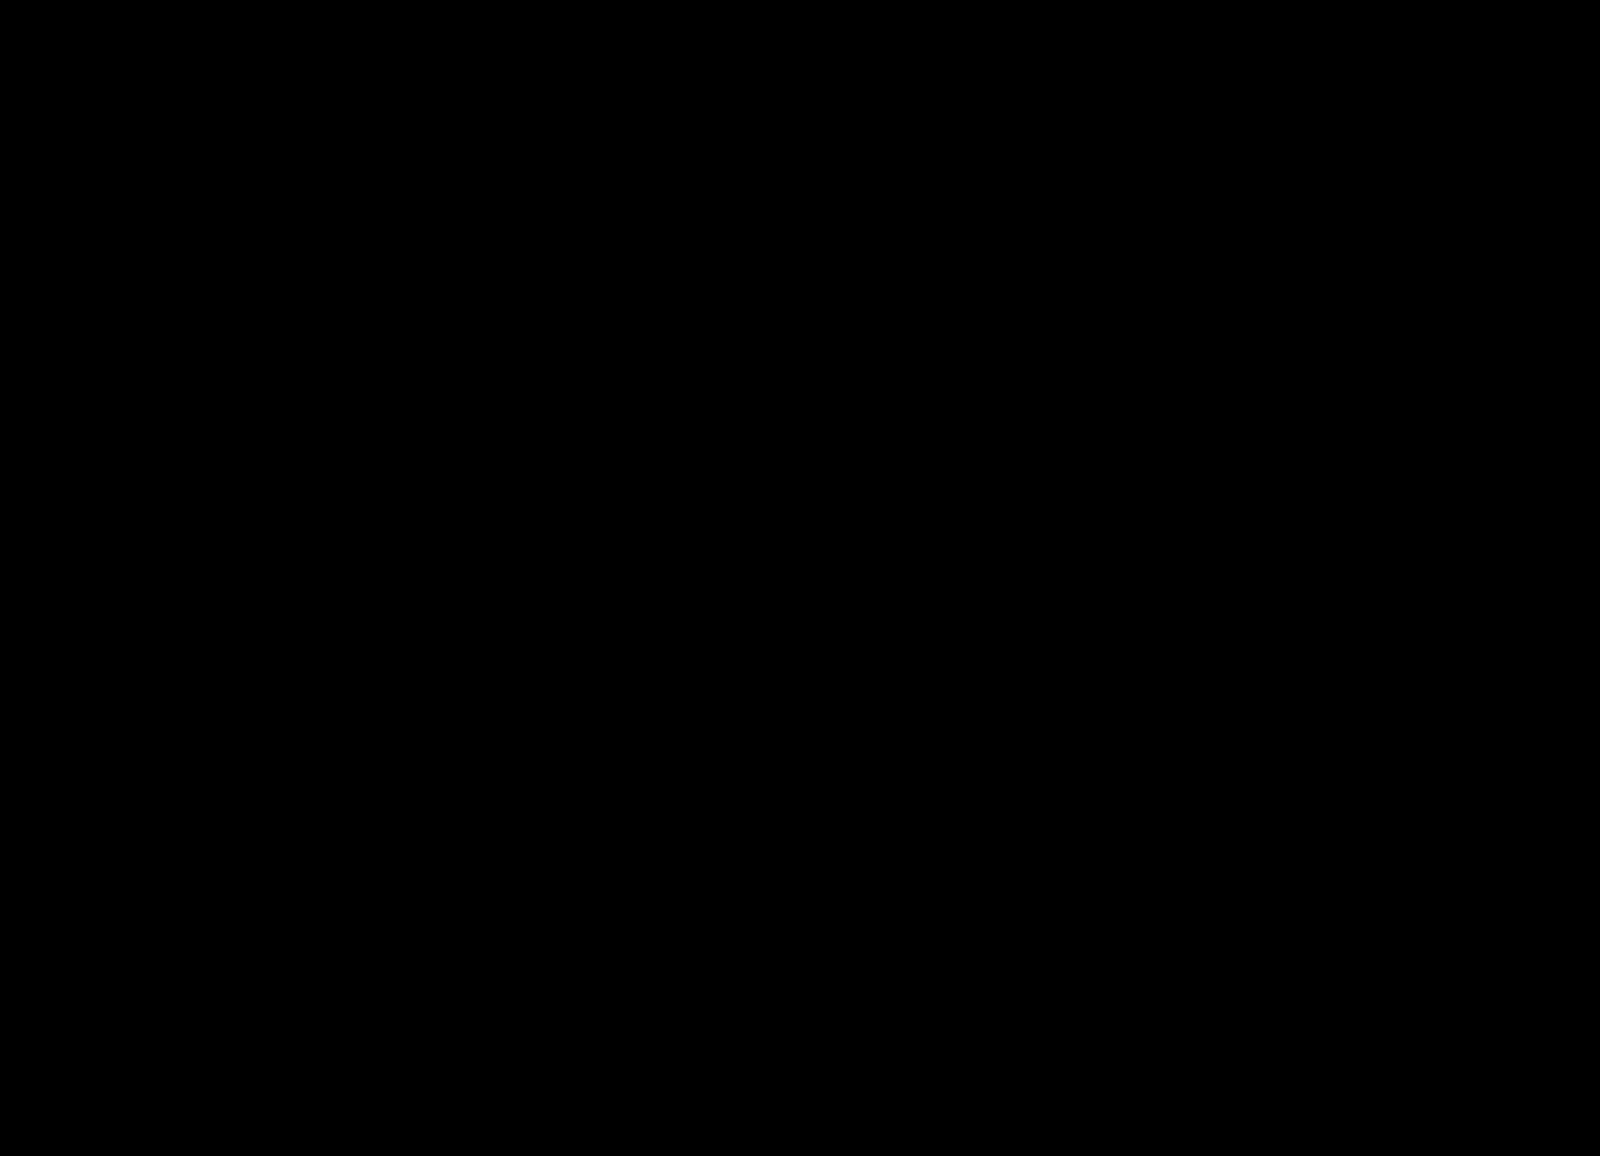 The molecular structure of Tenofovir.